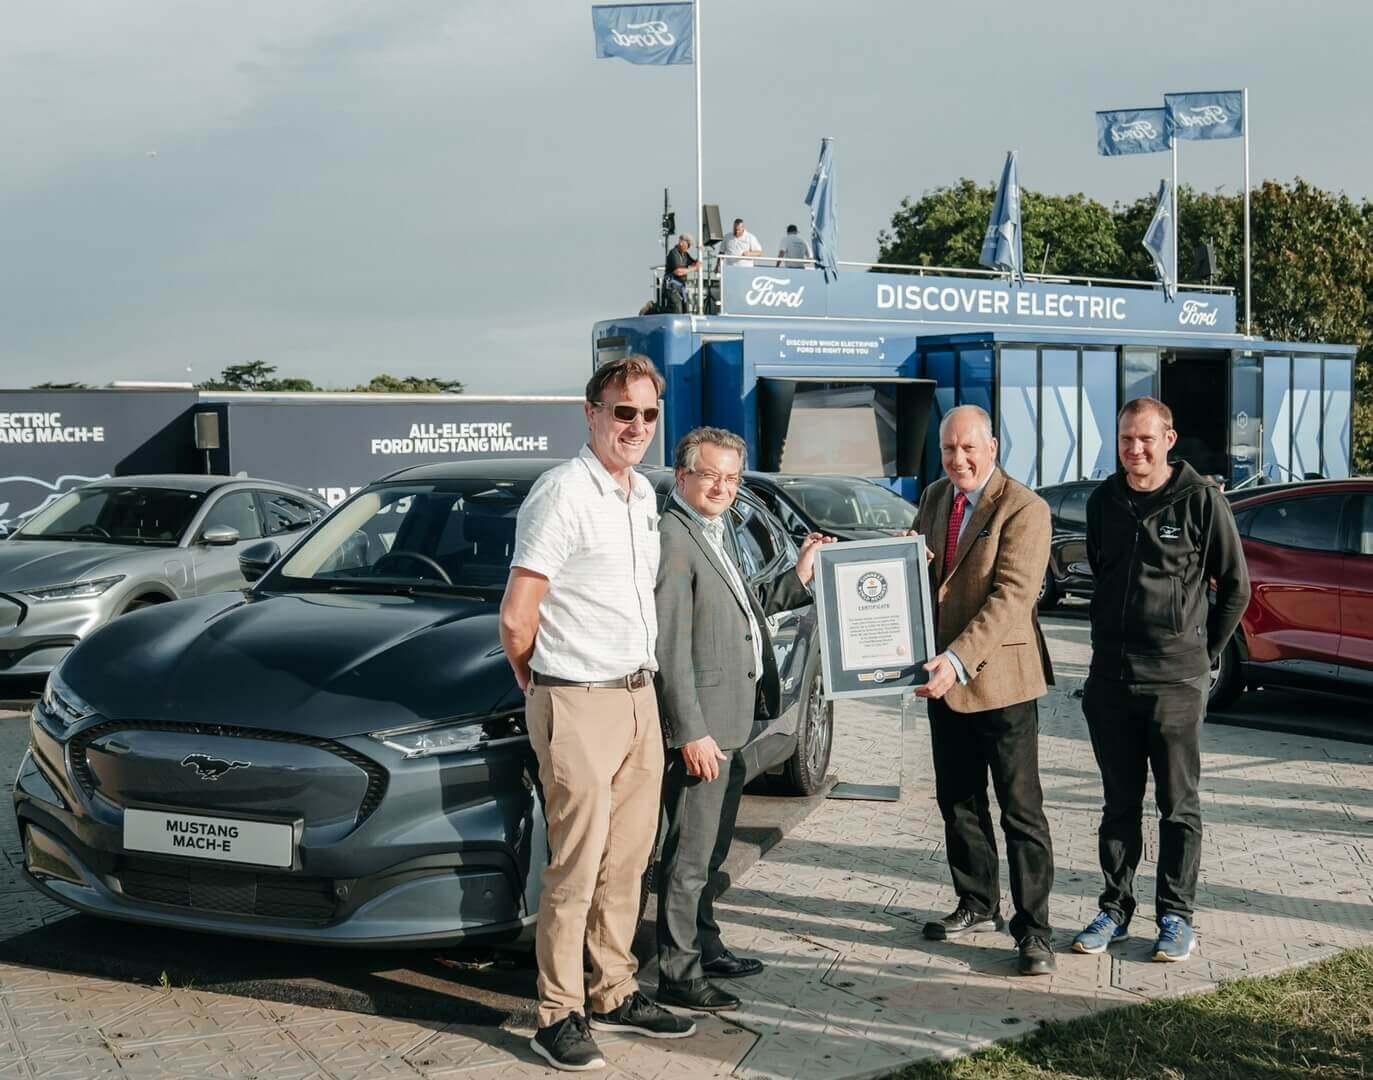 Электрический Ford Mustang Mach-E попал вКнигу рекордов Гиннесса